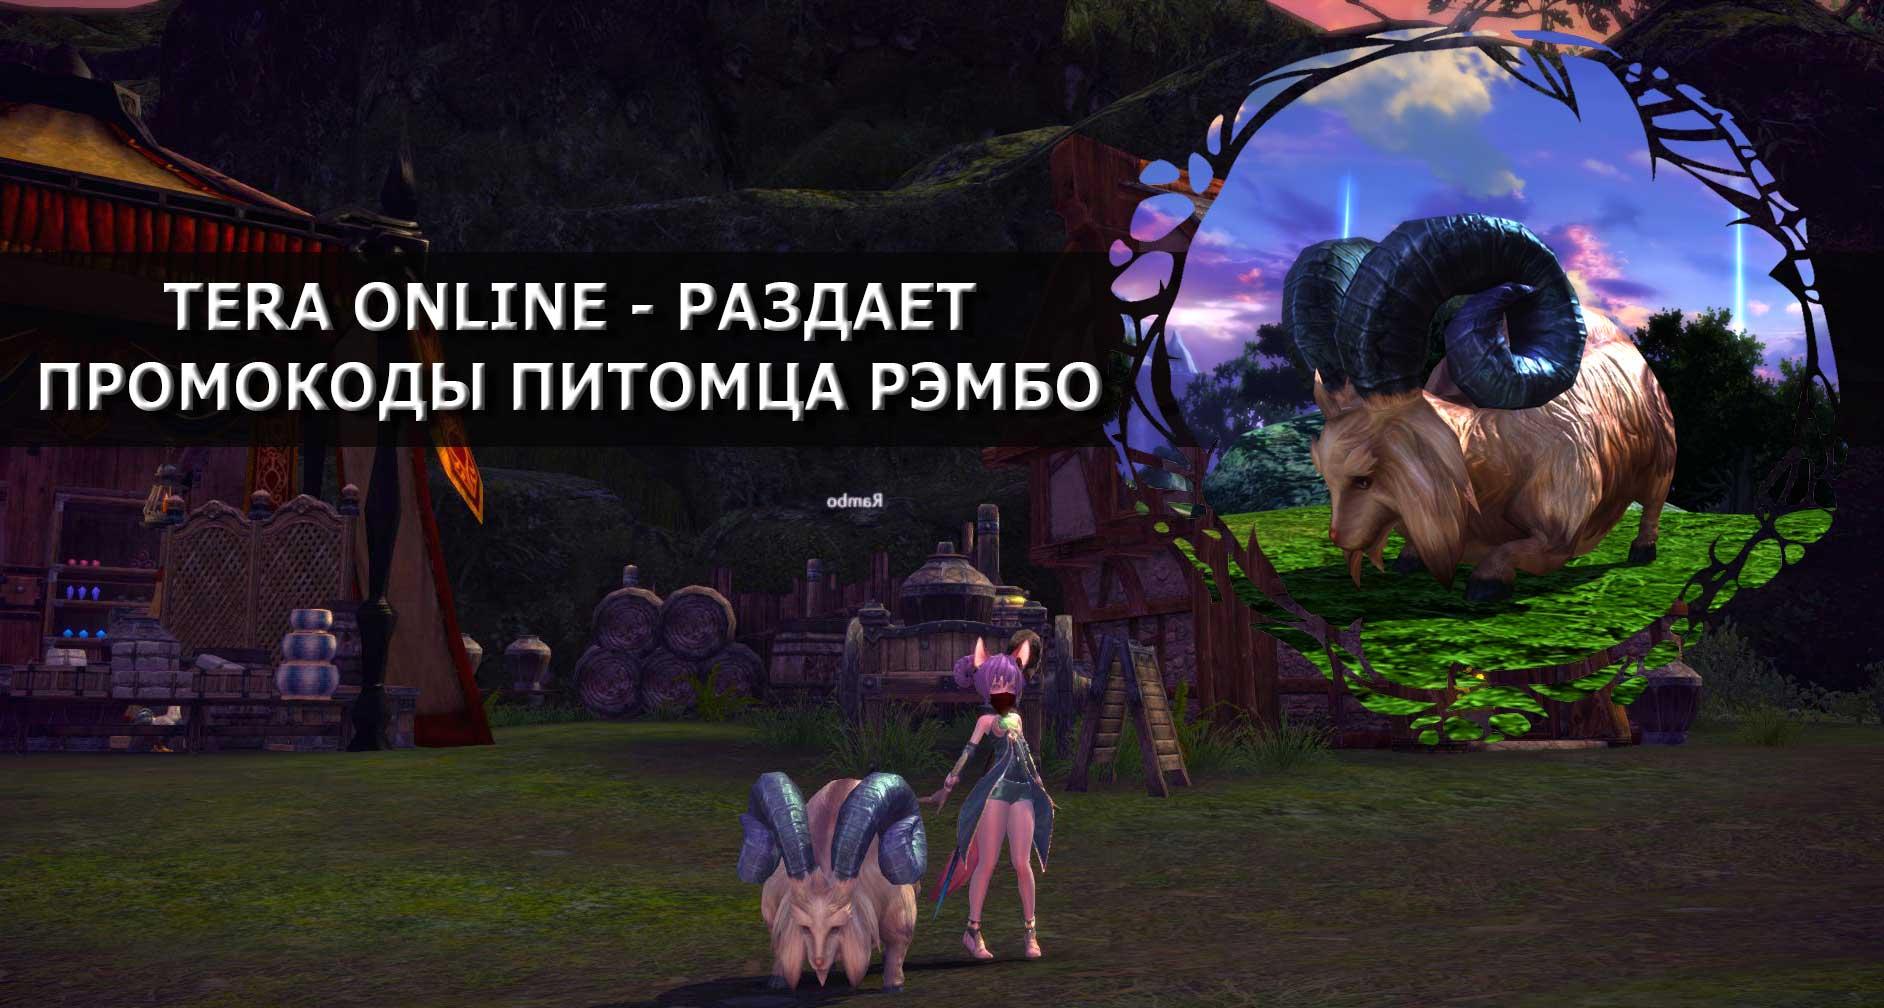 TERA_promo_gameli-1f